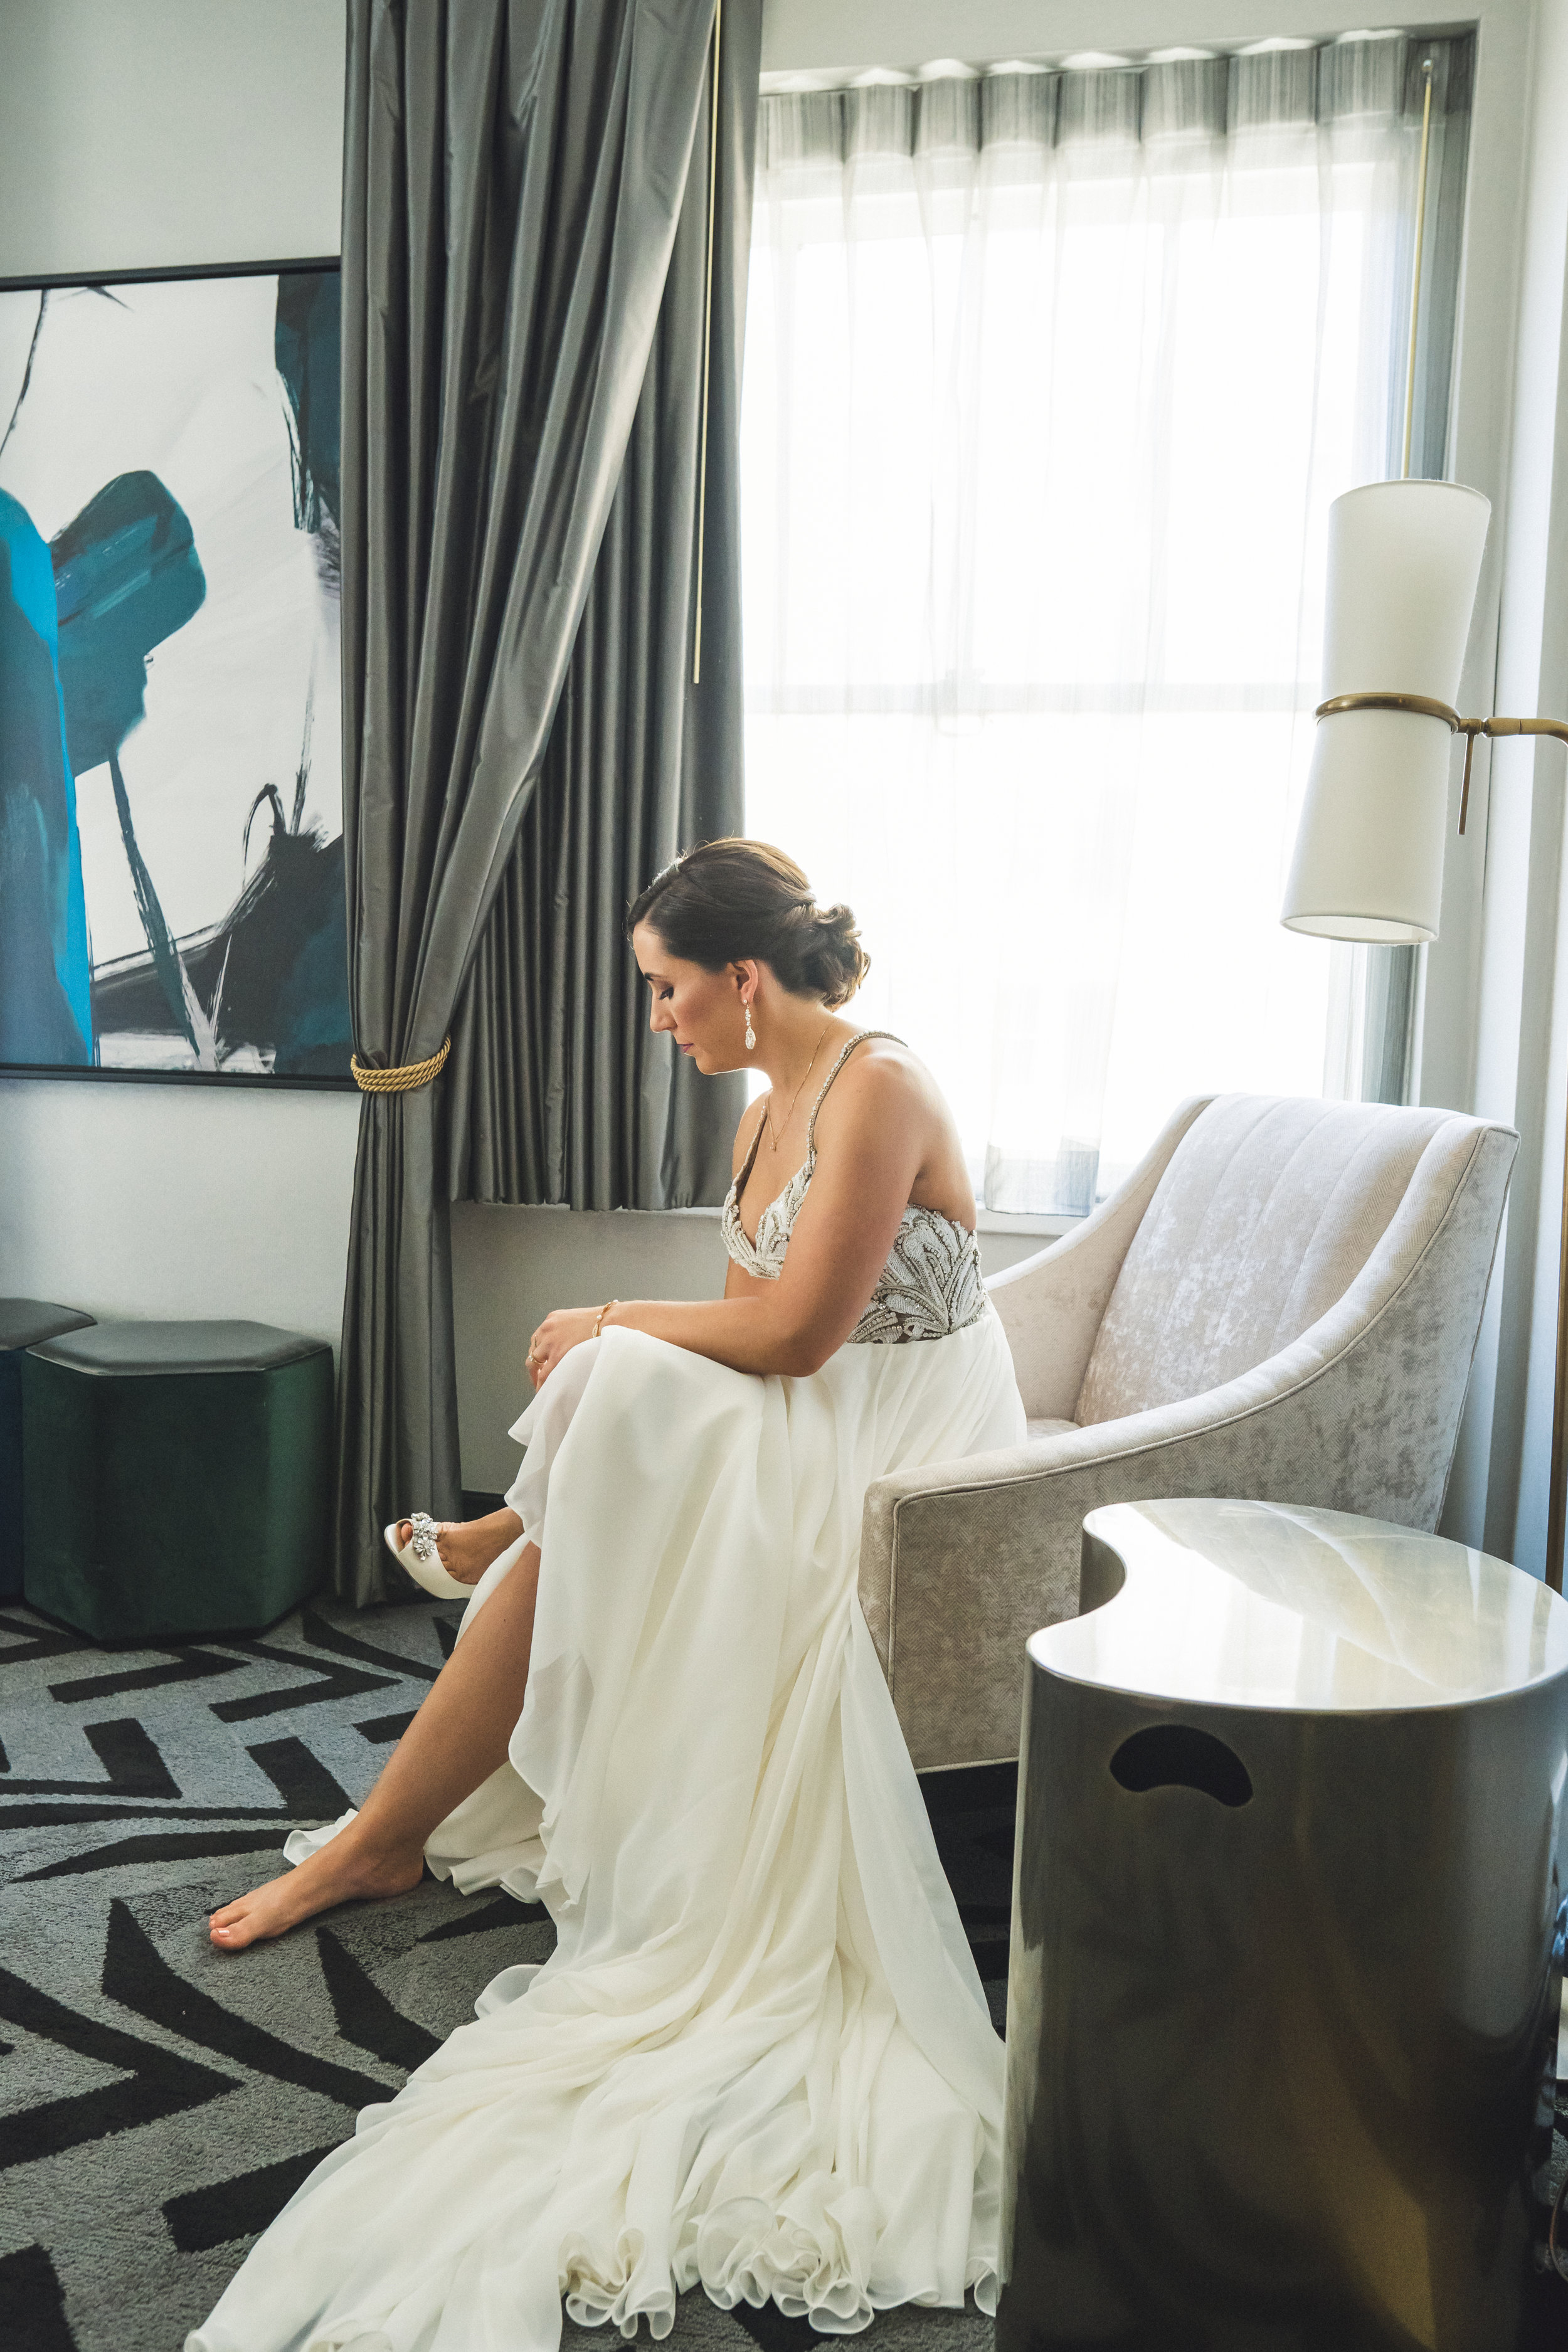 kimpton-hotel-chicago-bride-getting-ready-shoes.jpg